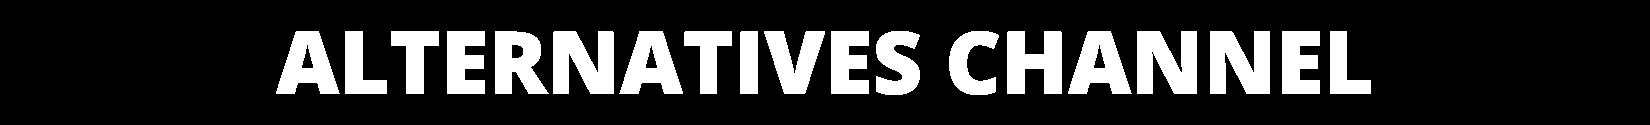 Alternatives Channel - ETF Trends